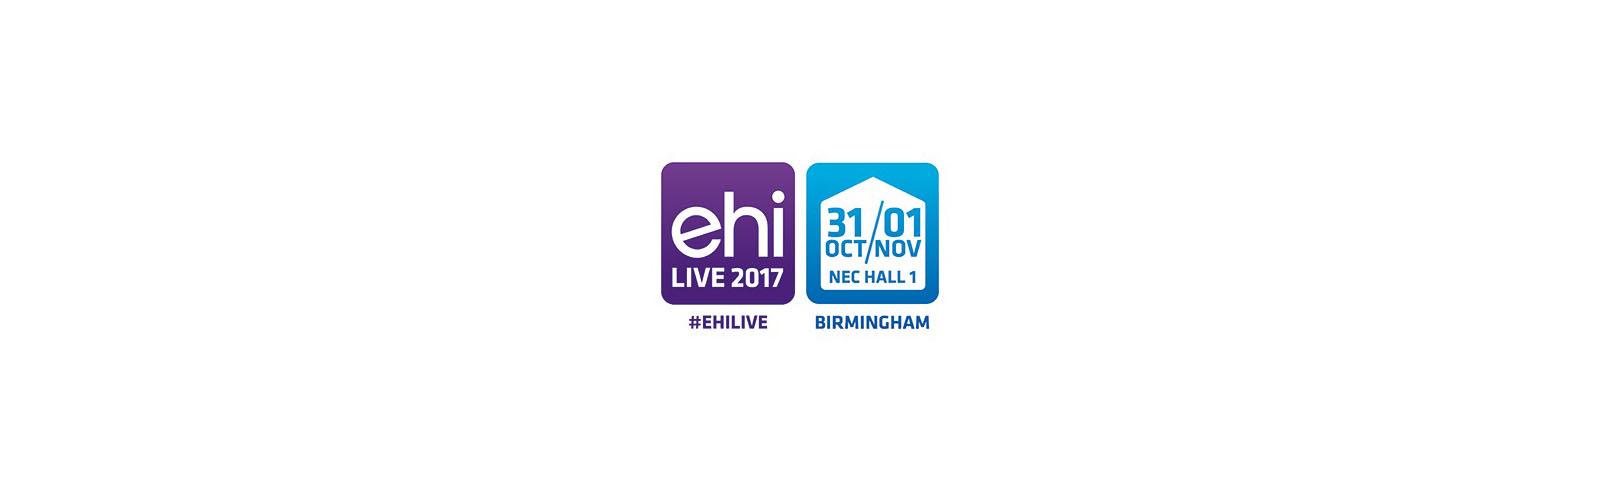 EHI Live 2017 Logo